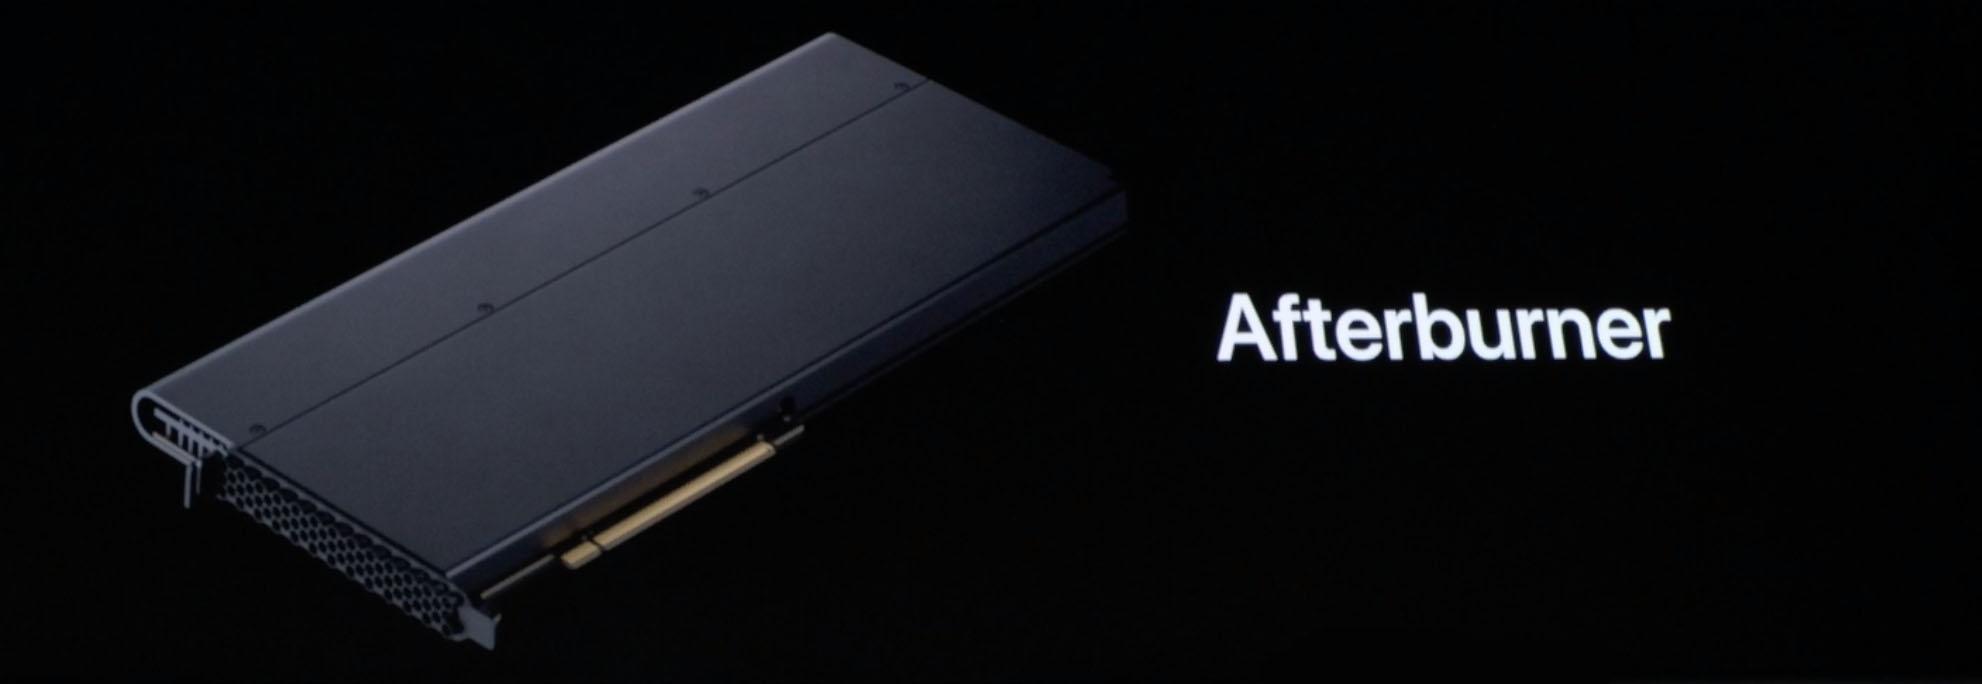 Afterburner Mac Pro